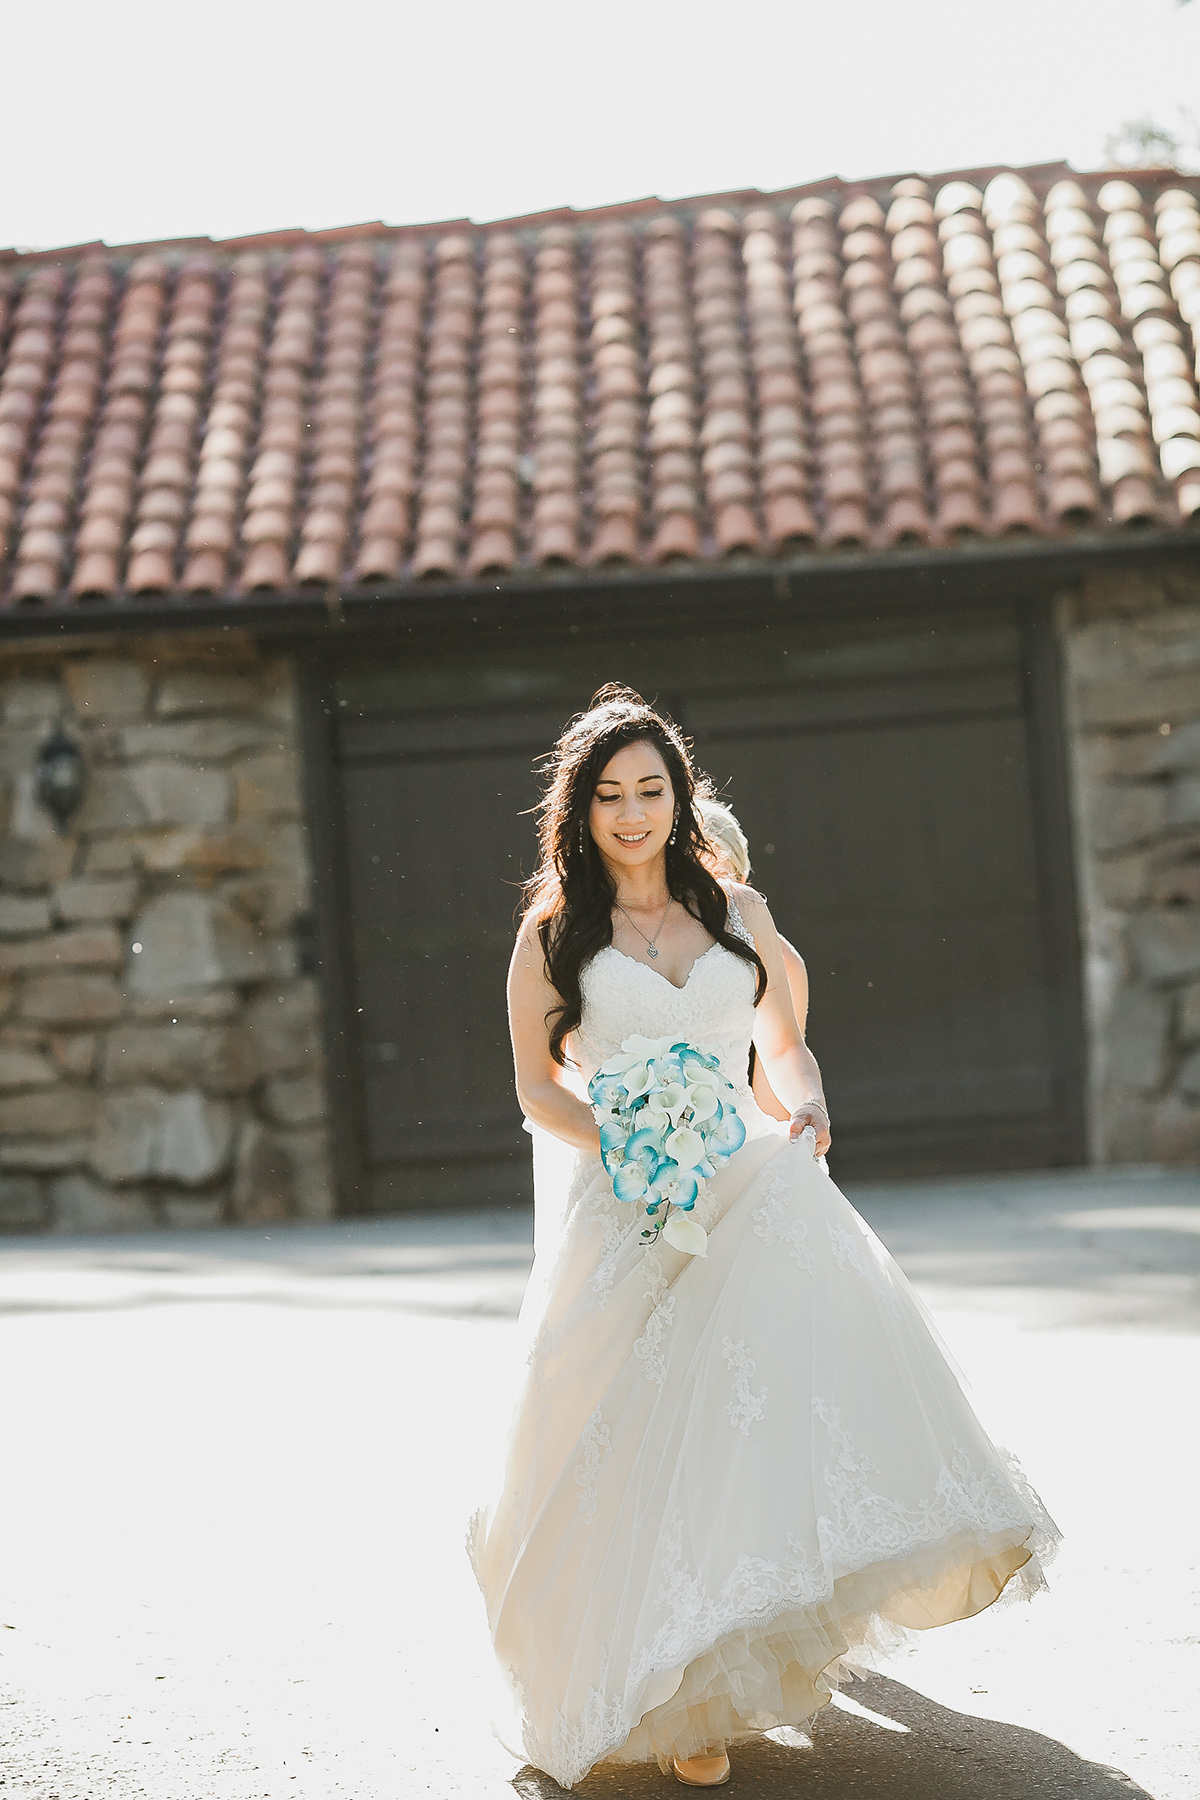 kristine_robert_wedding057.jpg